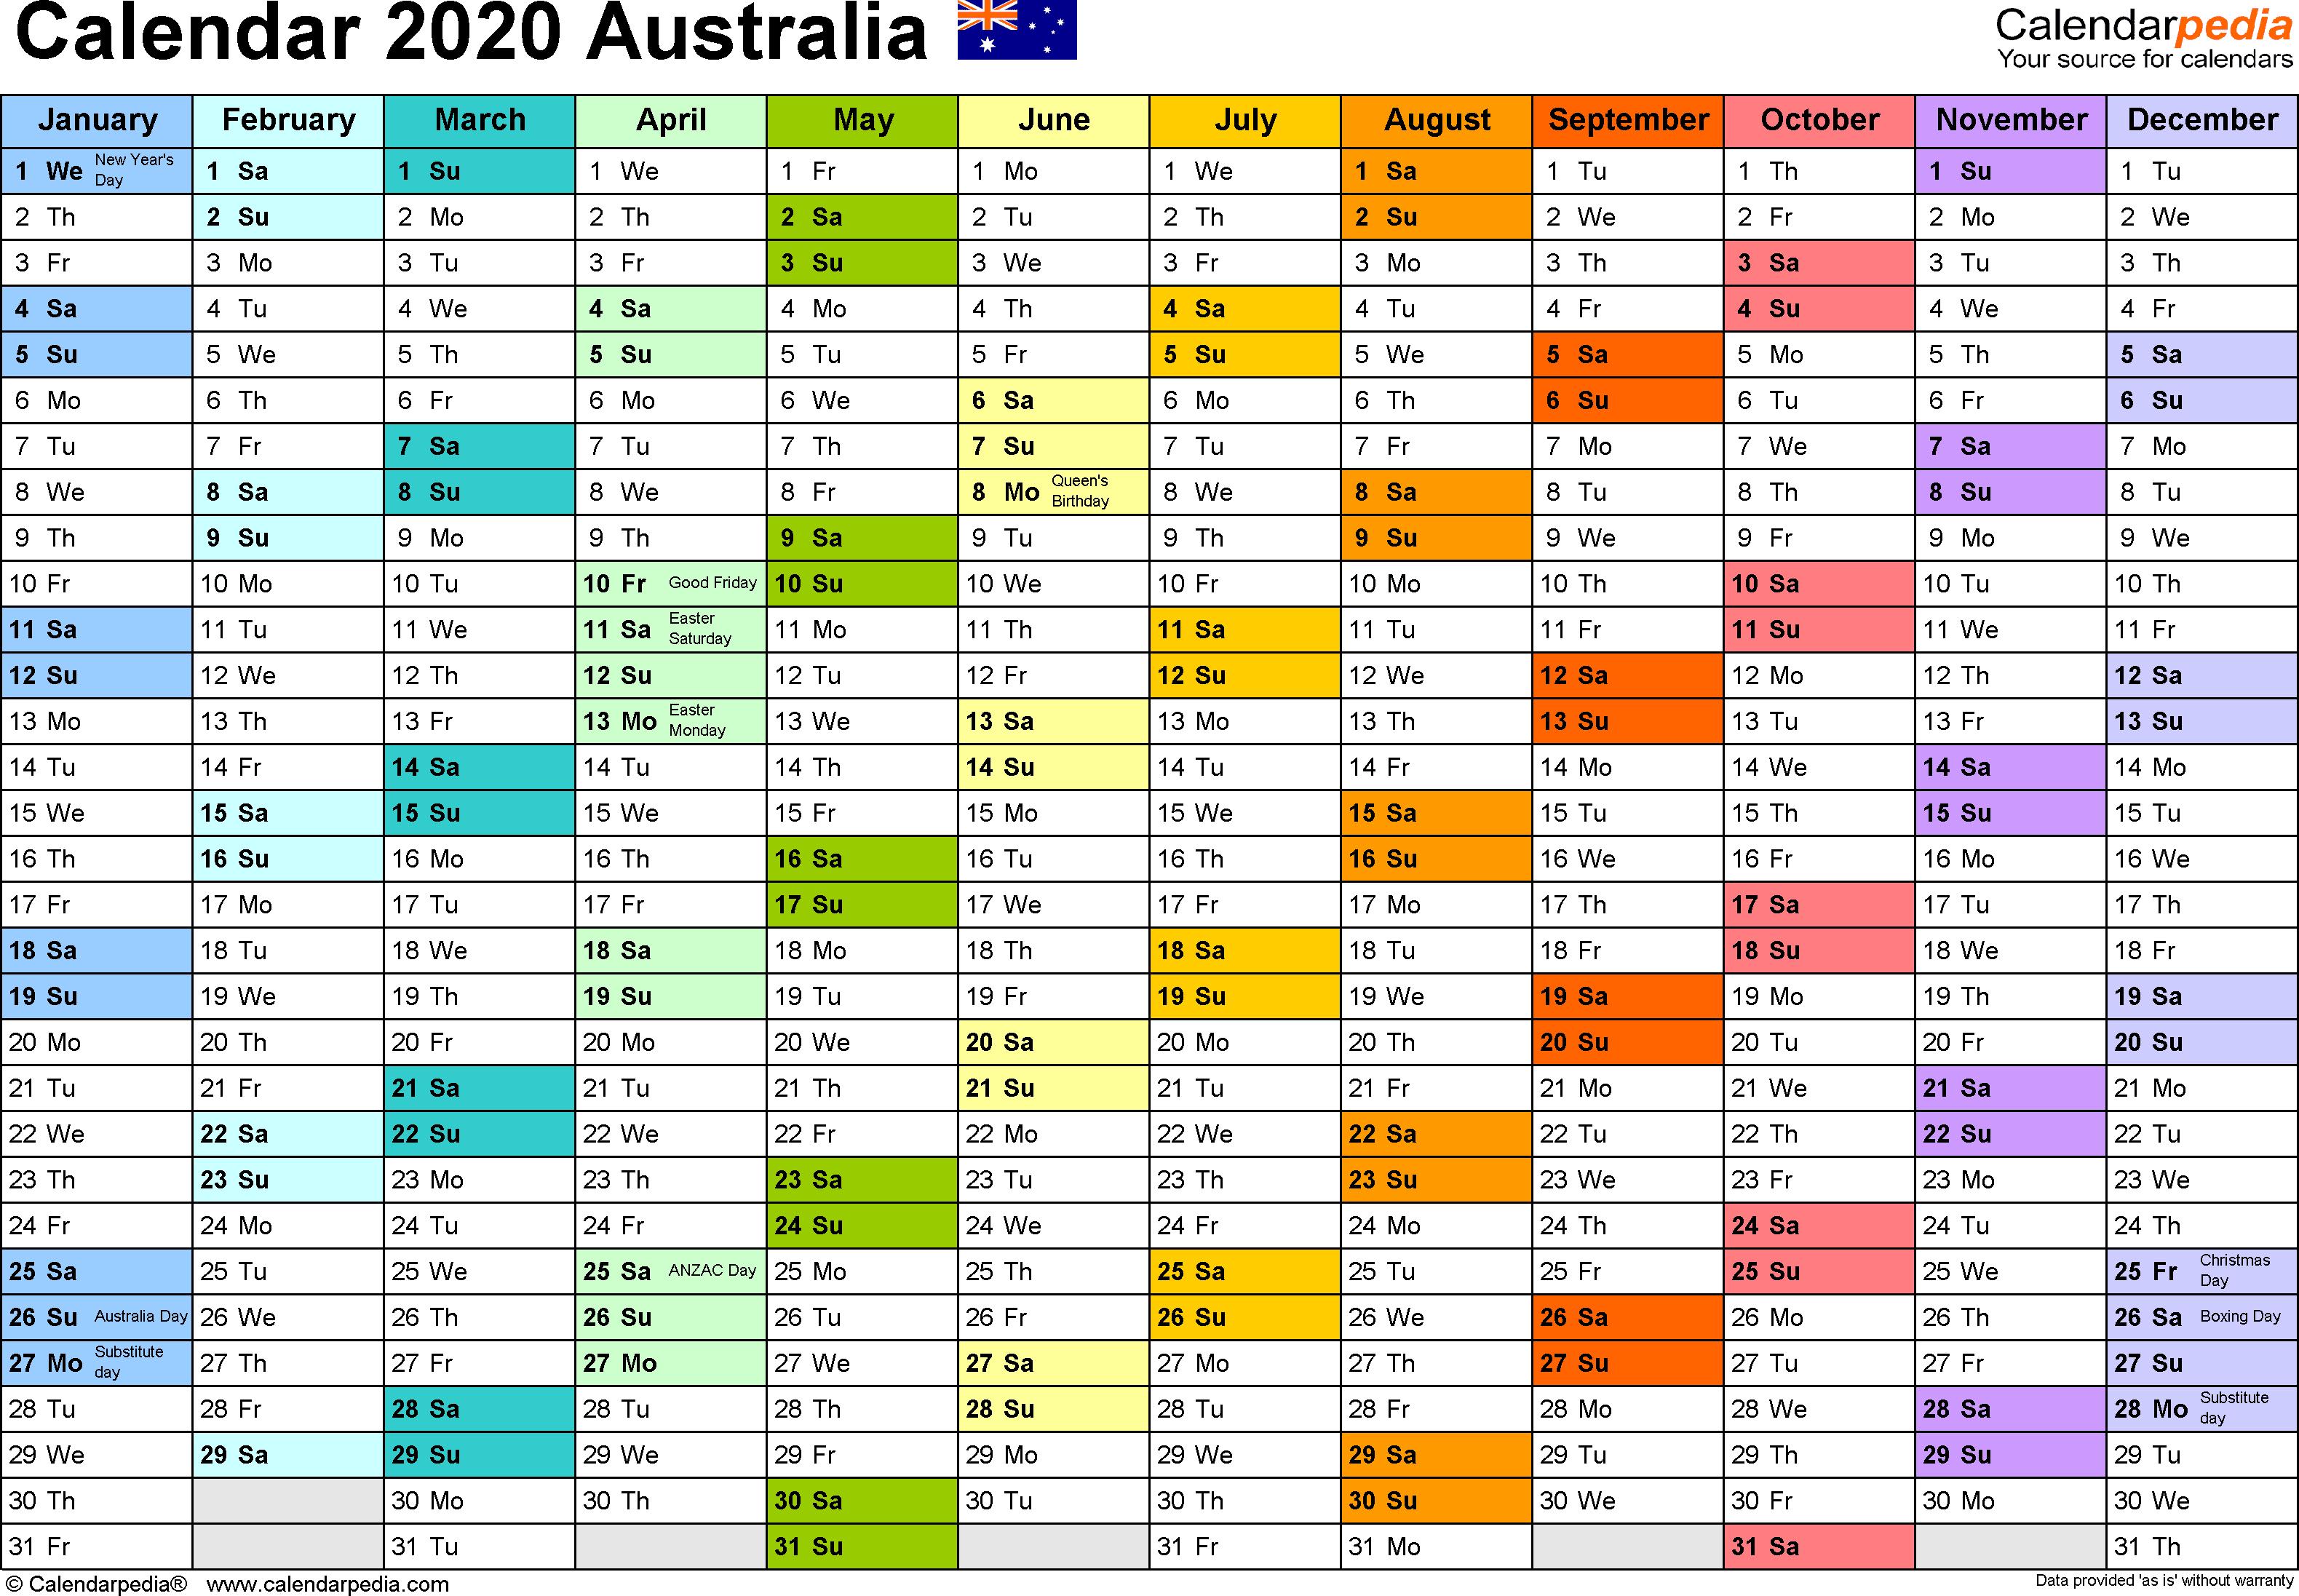 Australia Calendar 2020 - Free Printable Pdf Templates inside 2020 Qld School Calendar Printable